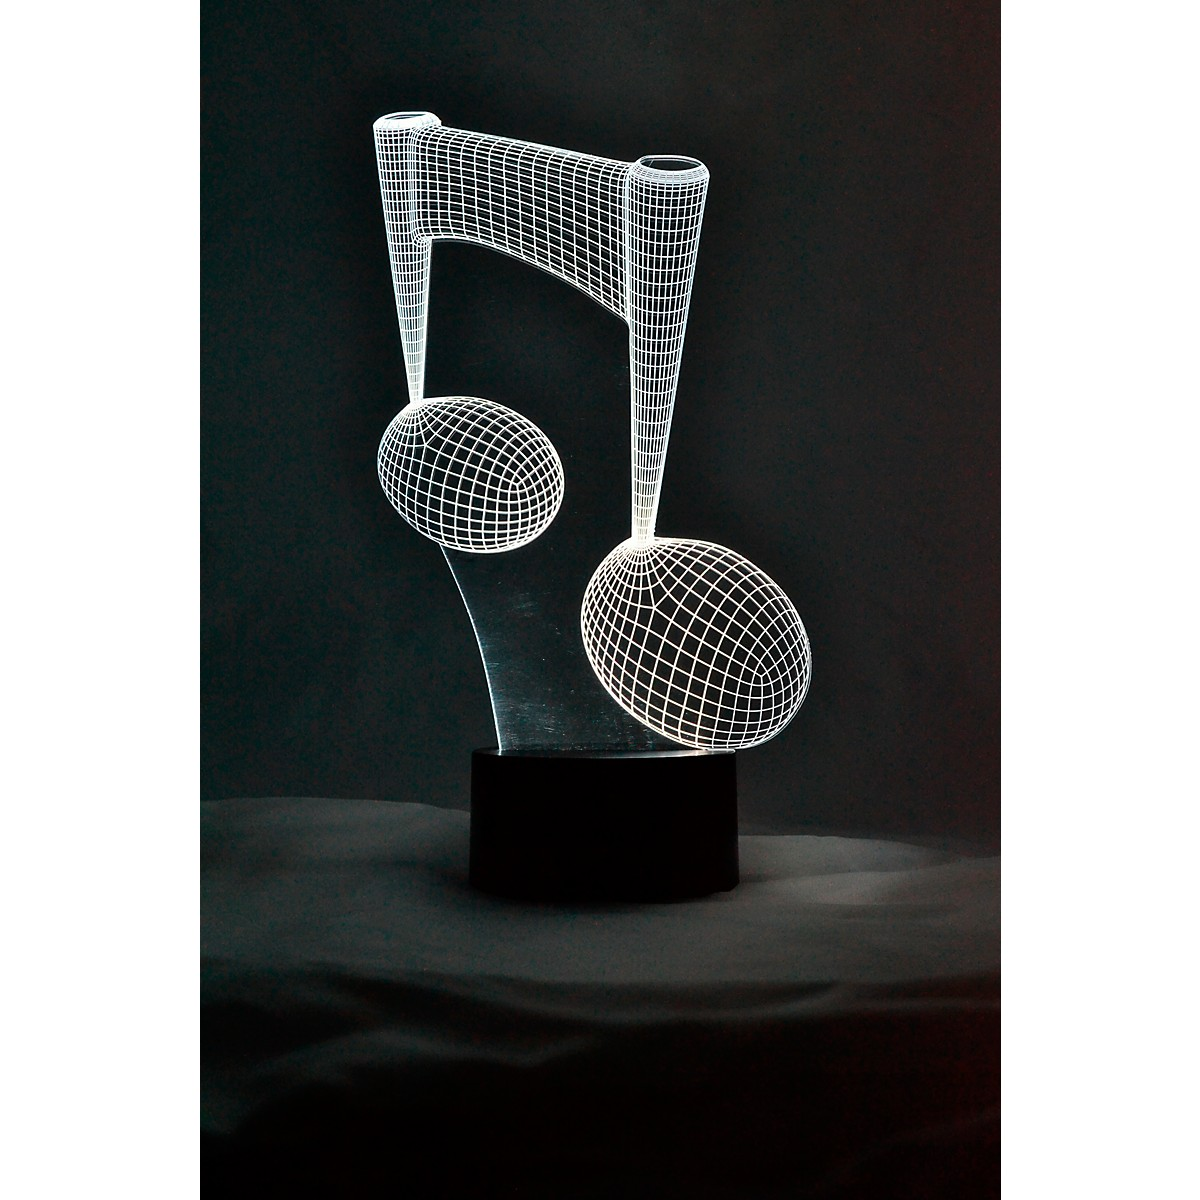 AIM 8th Note 3D LED Lamp Optical Illusion Light